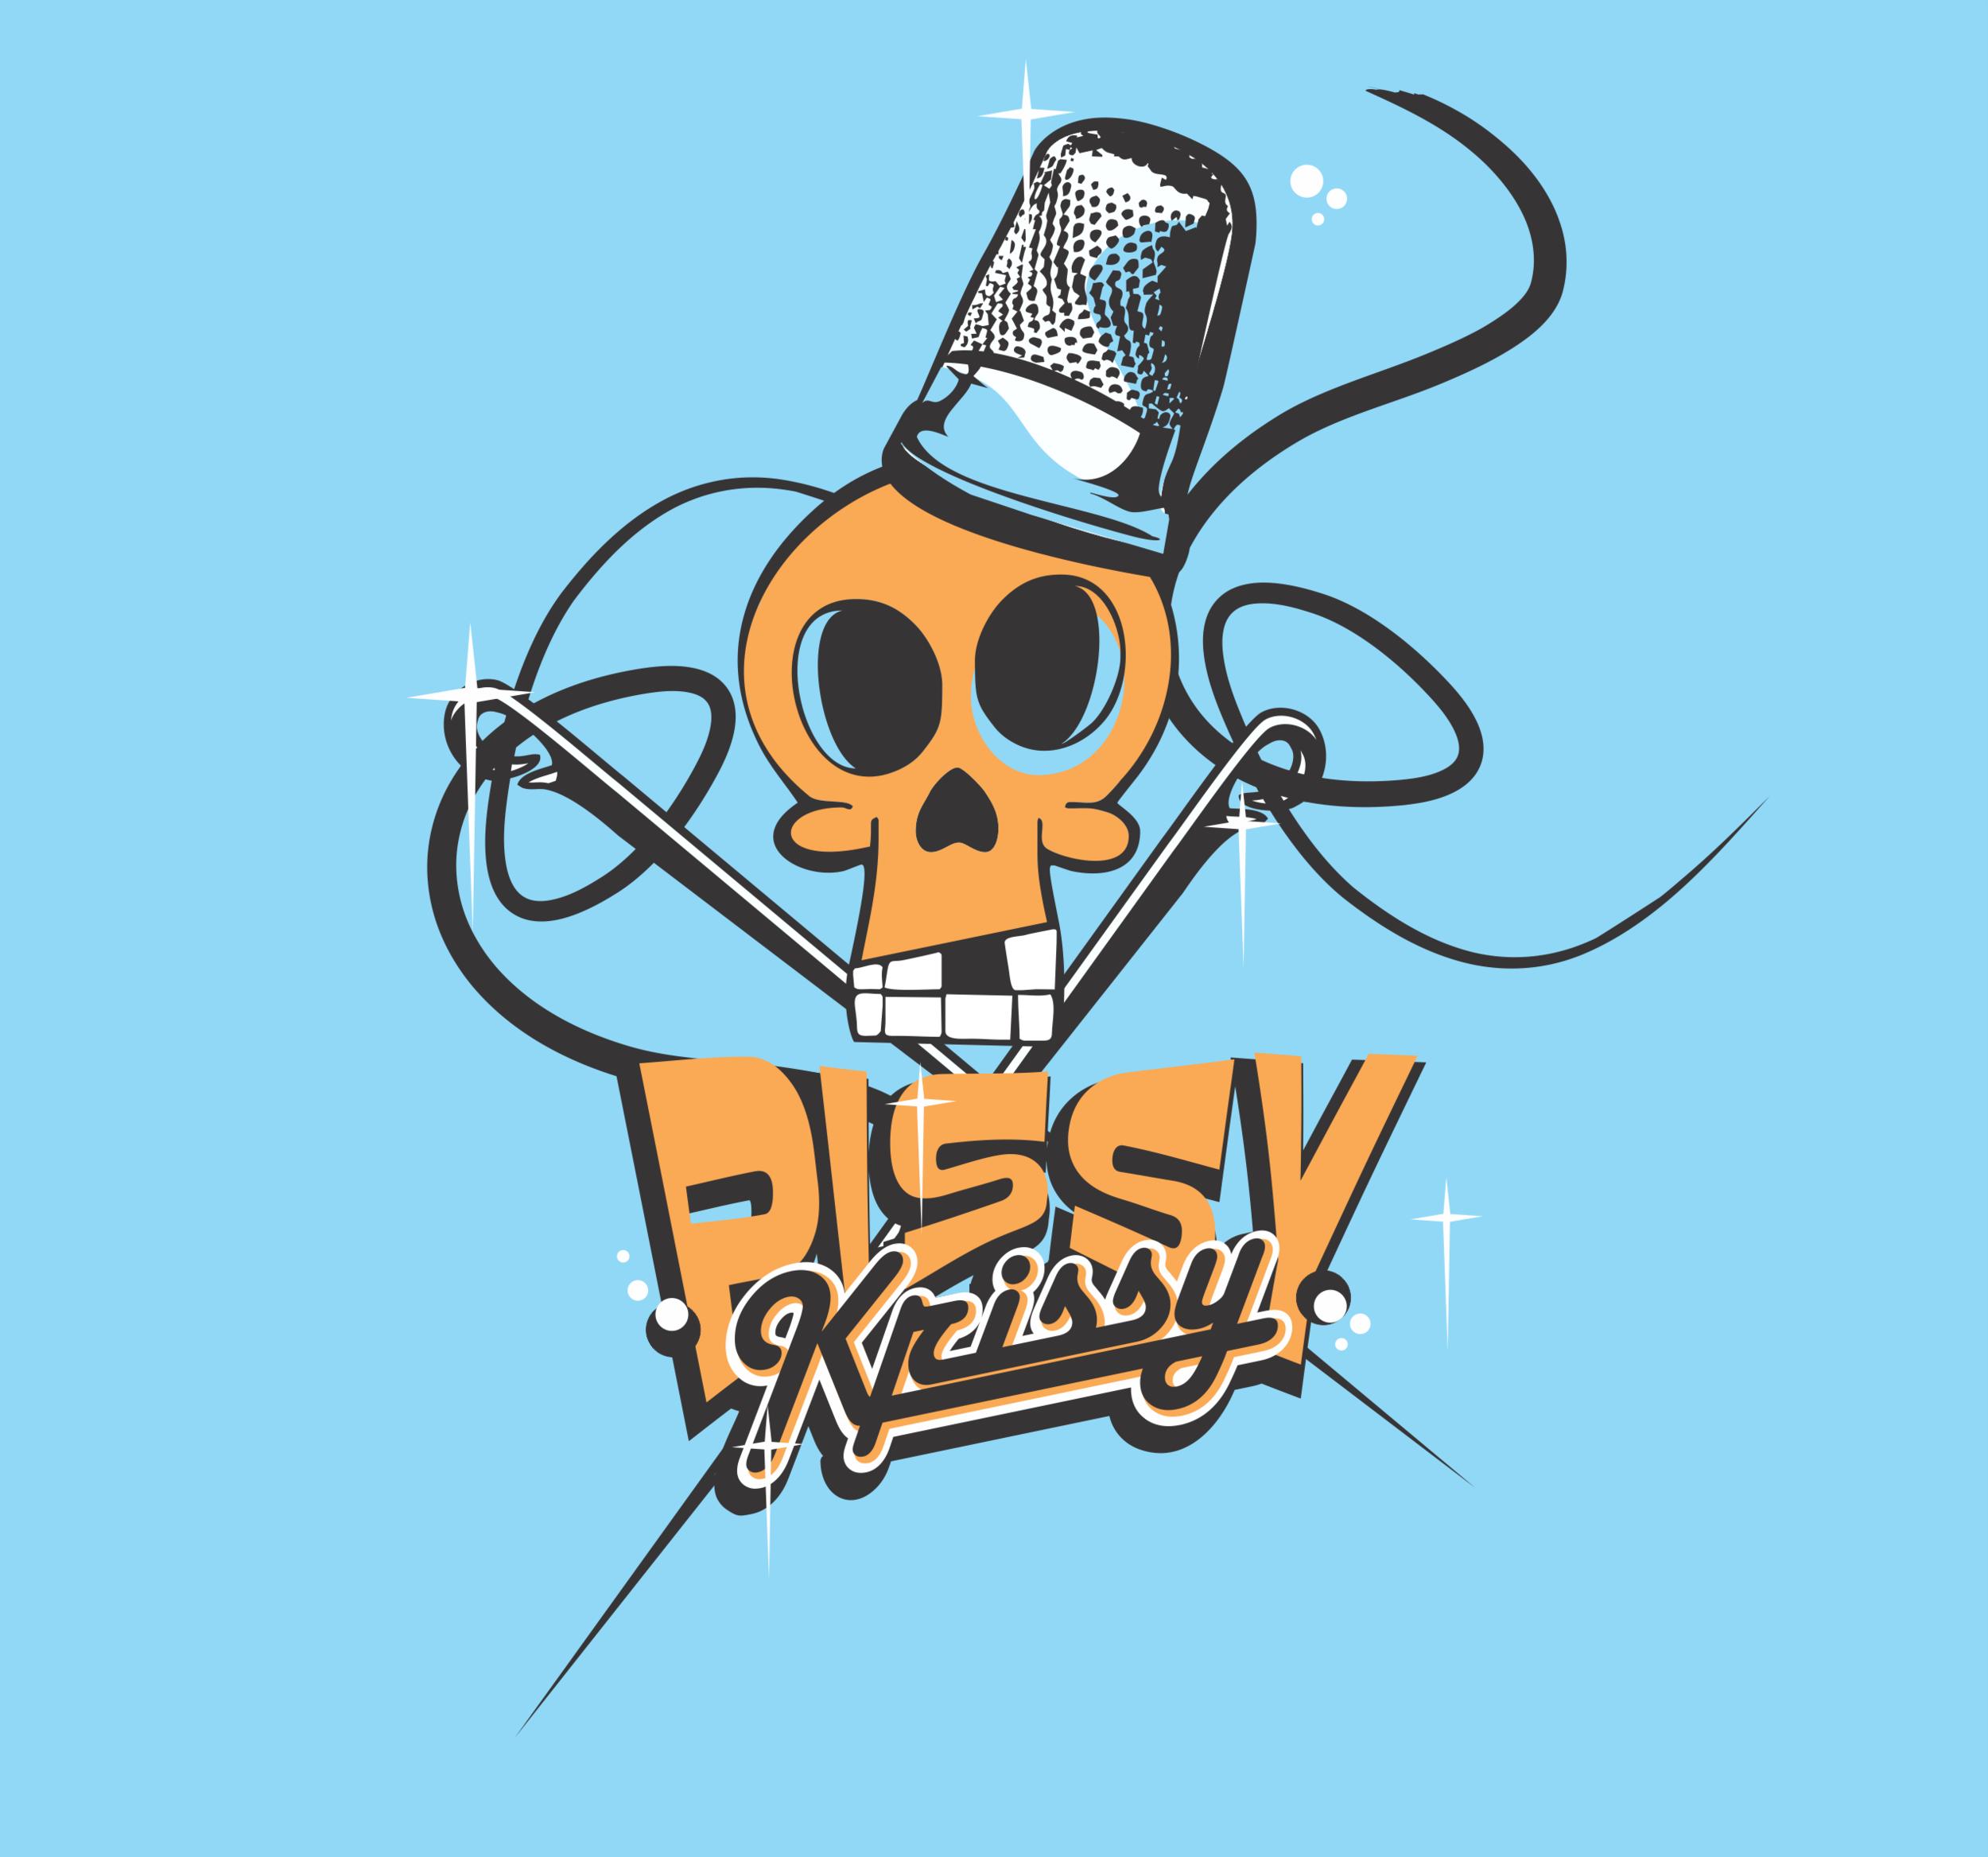 Pissykrissy.png